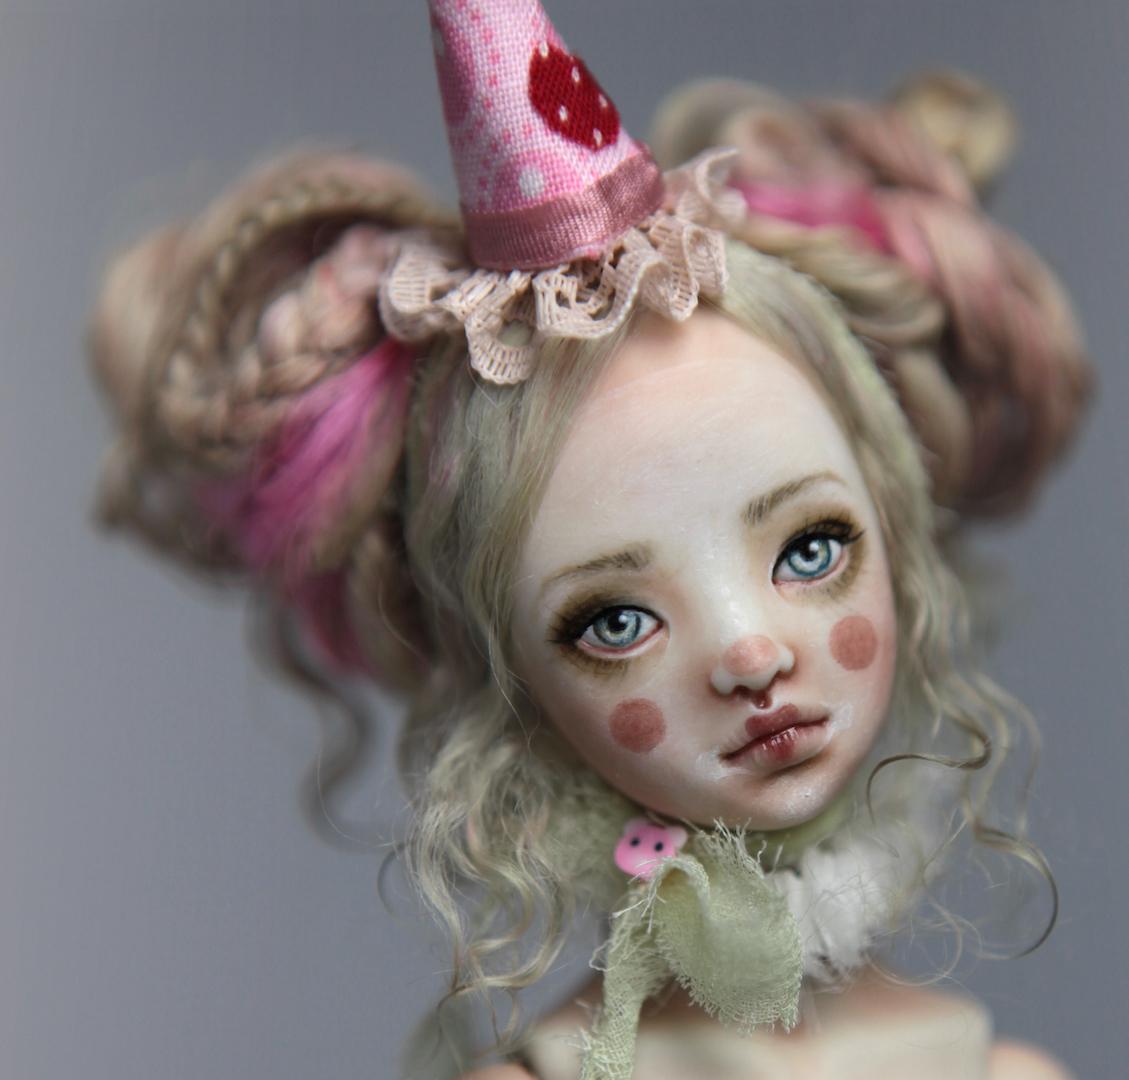 BJD Dolls | Roadside Circus Clown Maya Porcelain BJD Doll by Forgotten Hearts